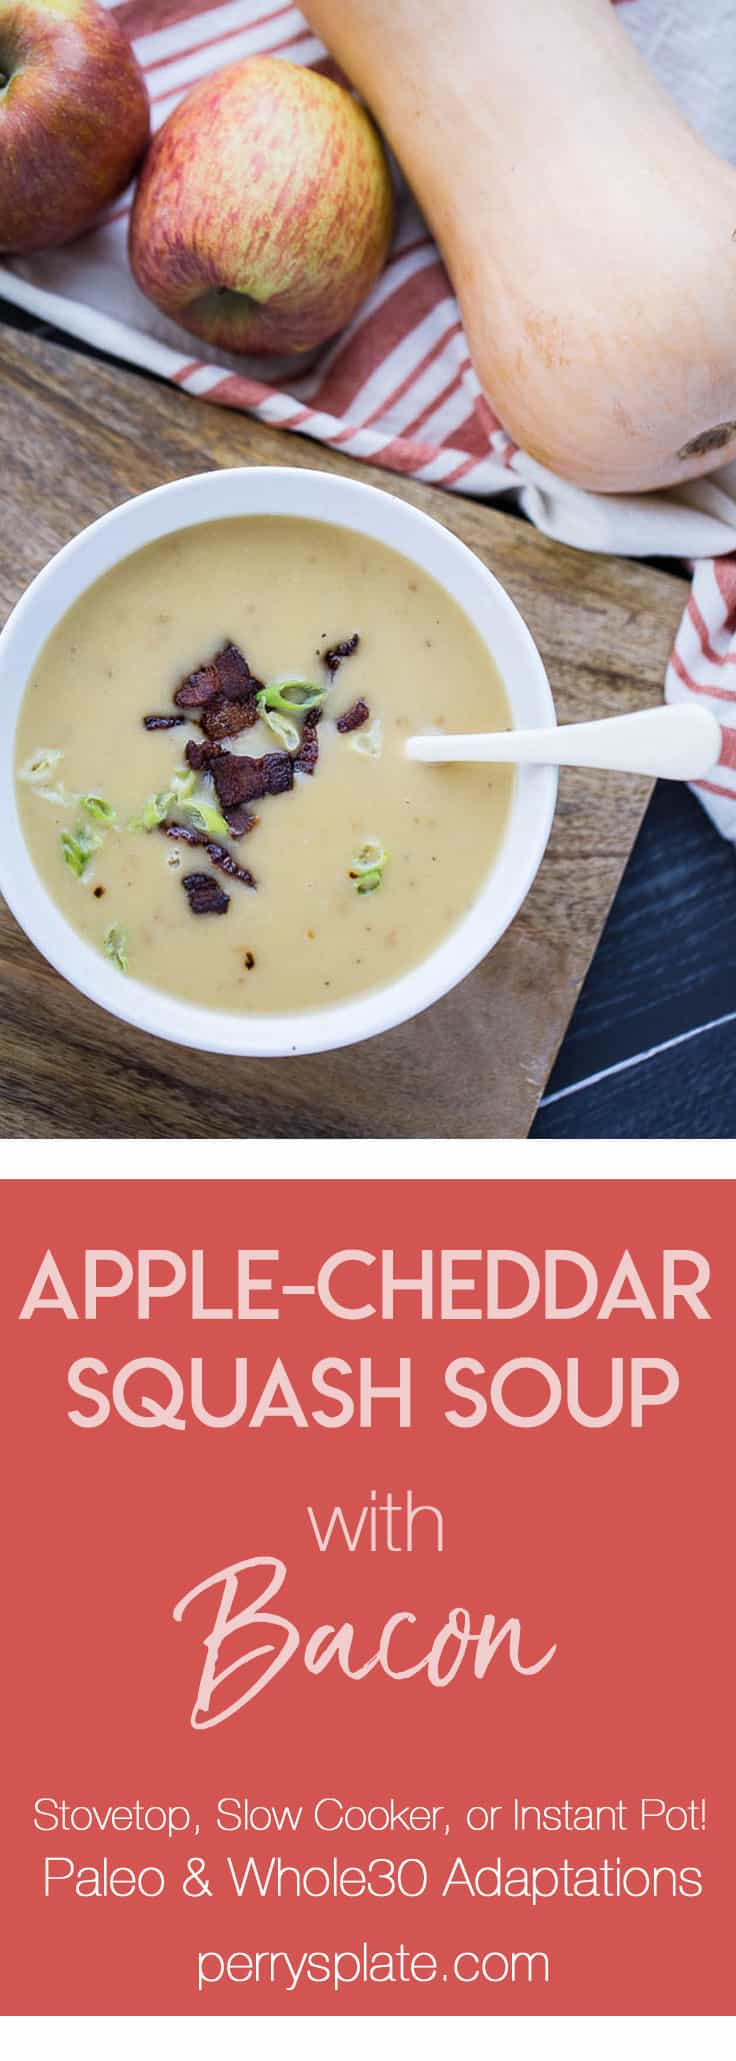 Apple-Squash Soup with Bacon | perrysplate.com | paleo recipes | Whole30 recipes | soup recipes